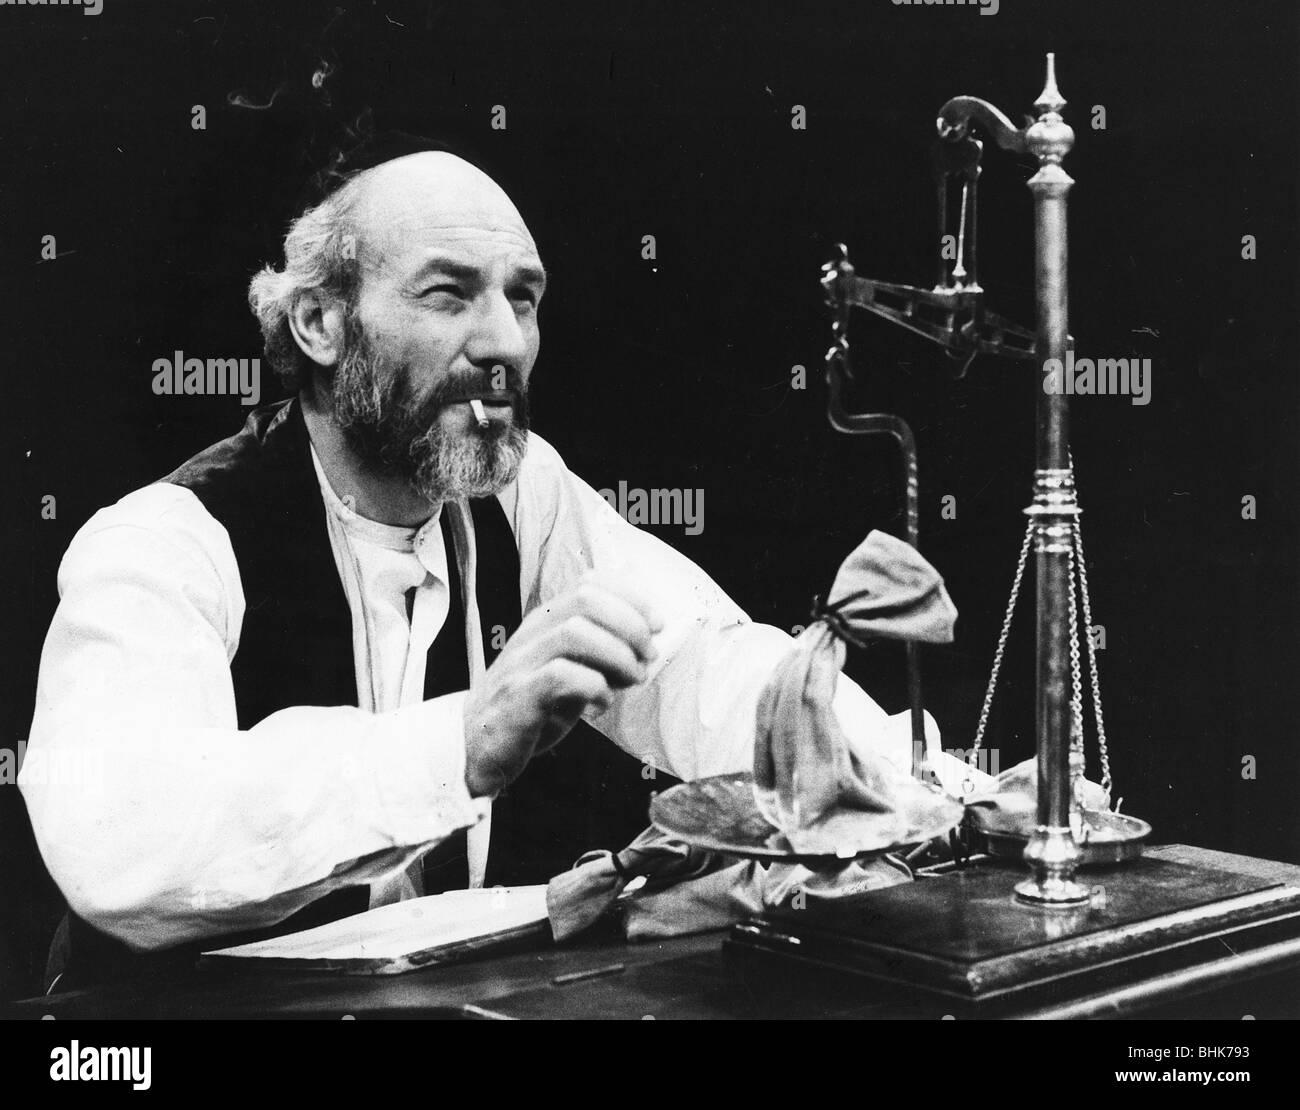 Patrick Stewart (1940-), British actor, 1979. - Stock Image